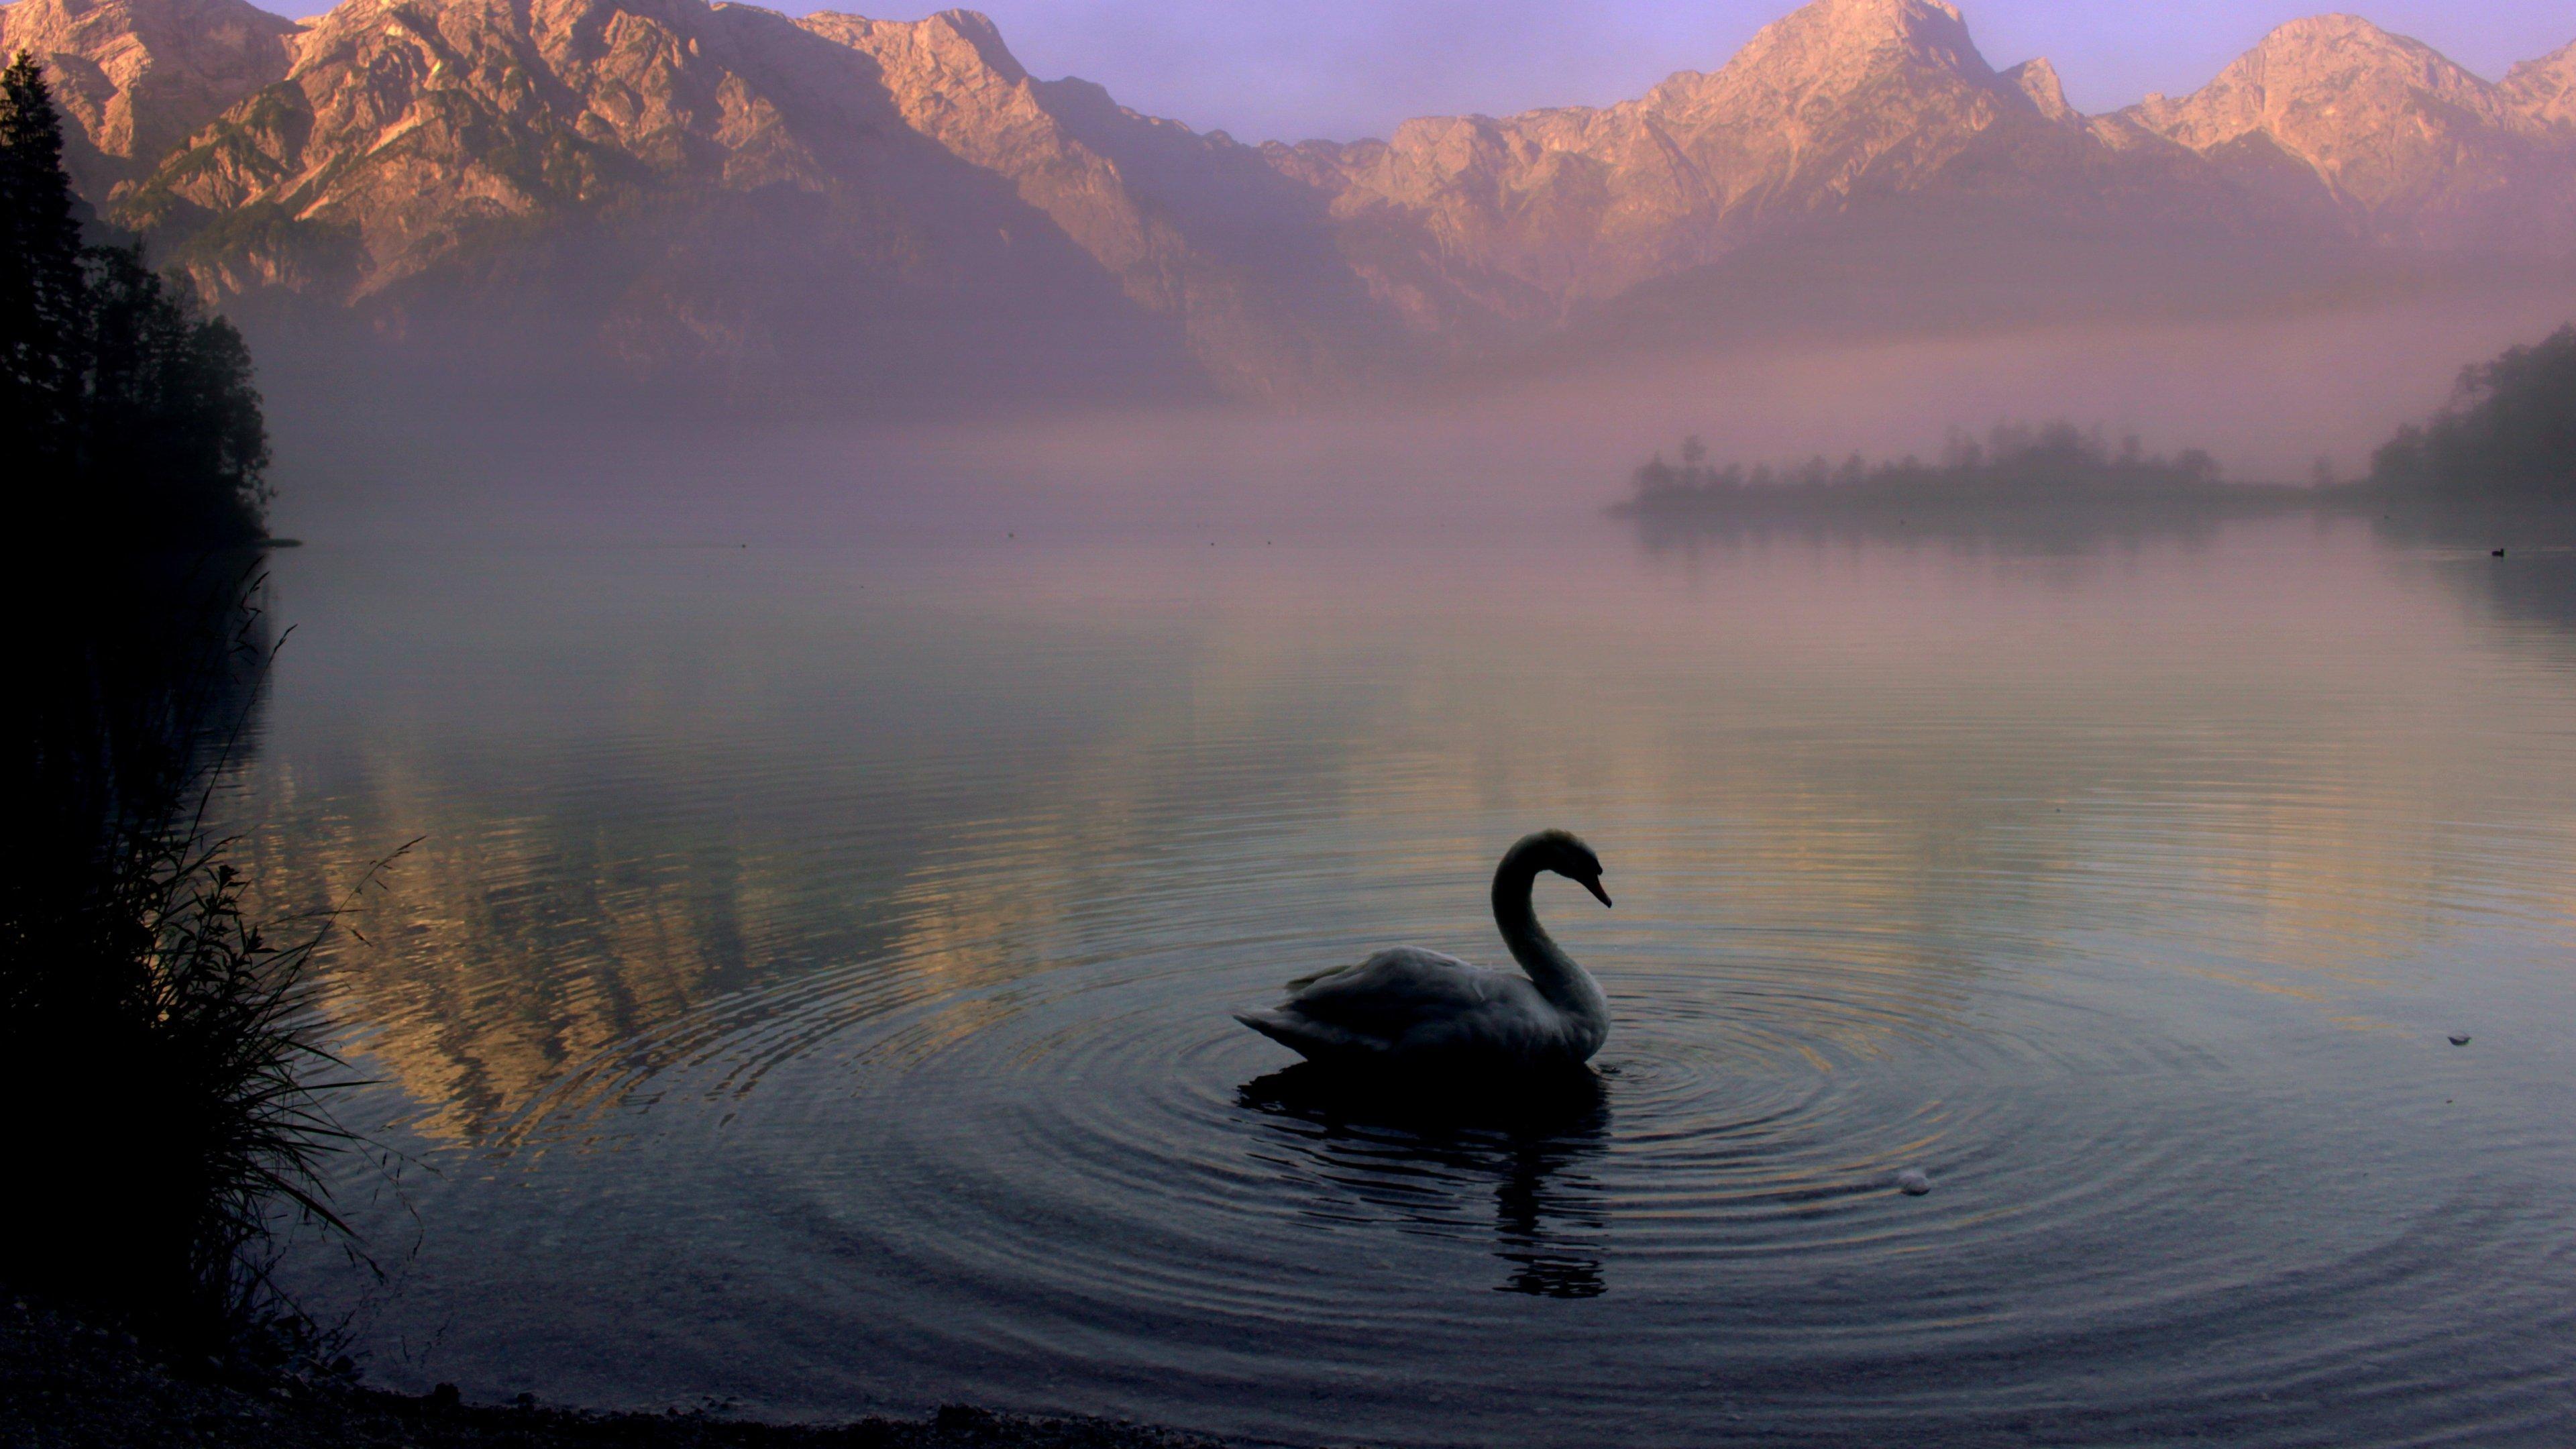 Iphone Android Desktop: Swan In Mountain Lake Wallpaper